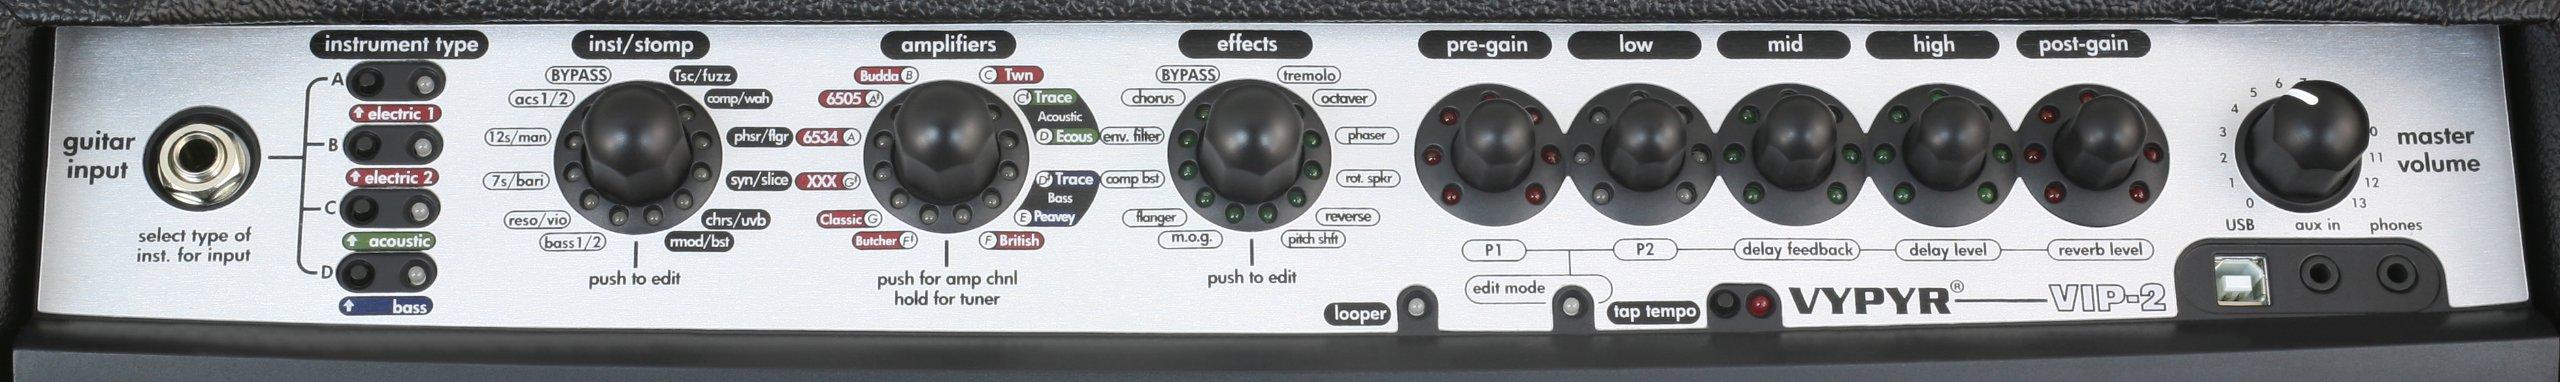 Peavey Vypyr VIP 2 - 40 Watt Modeling Instrument Amplifier by Peavey